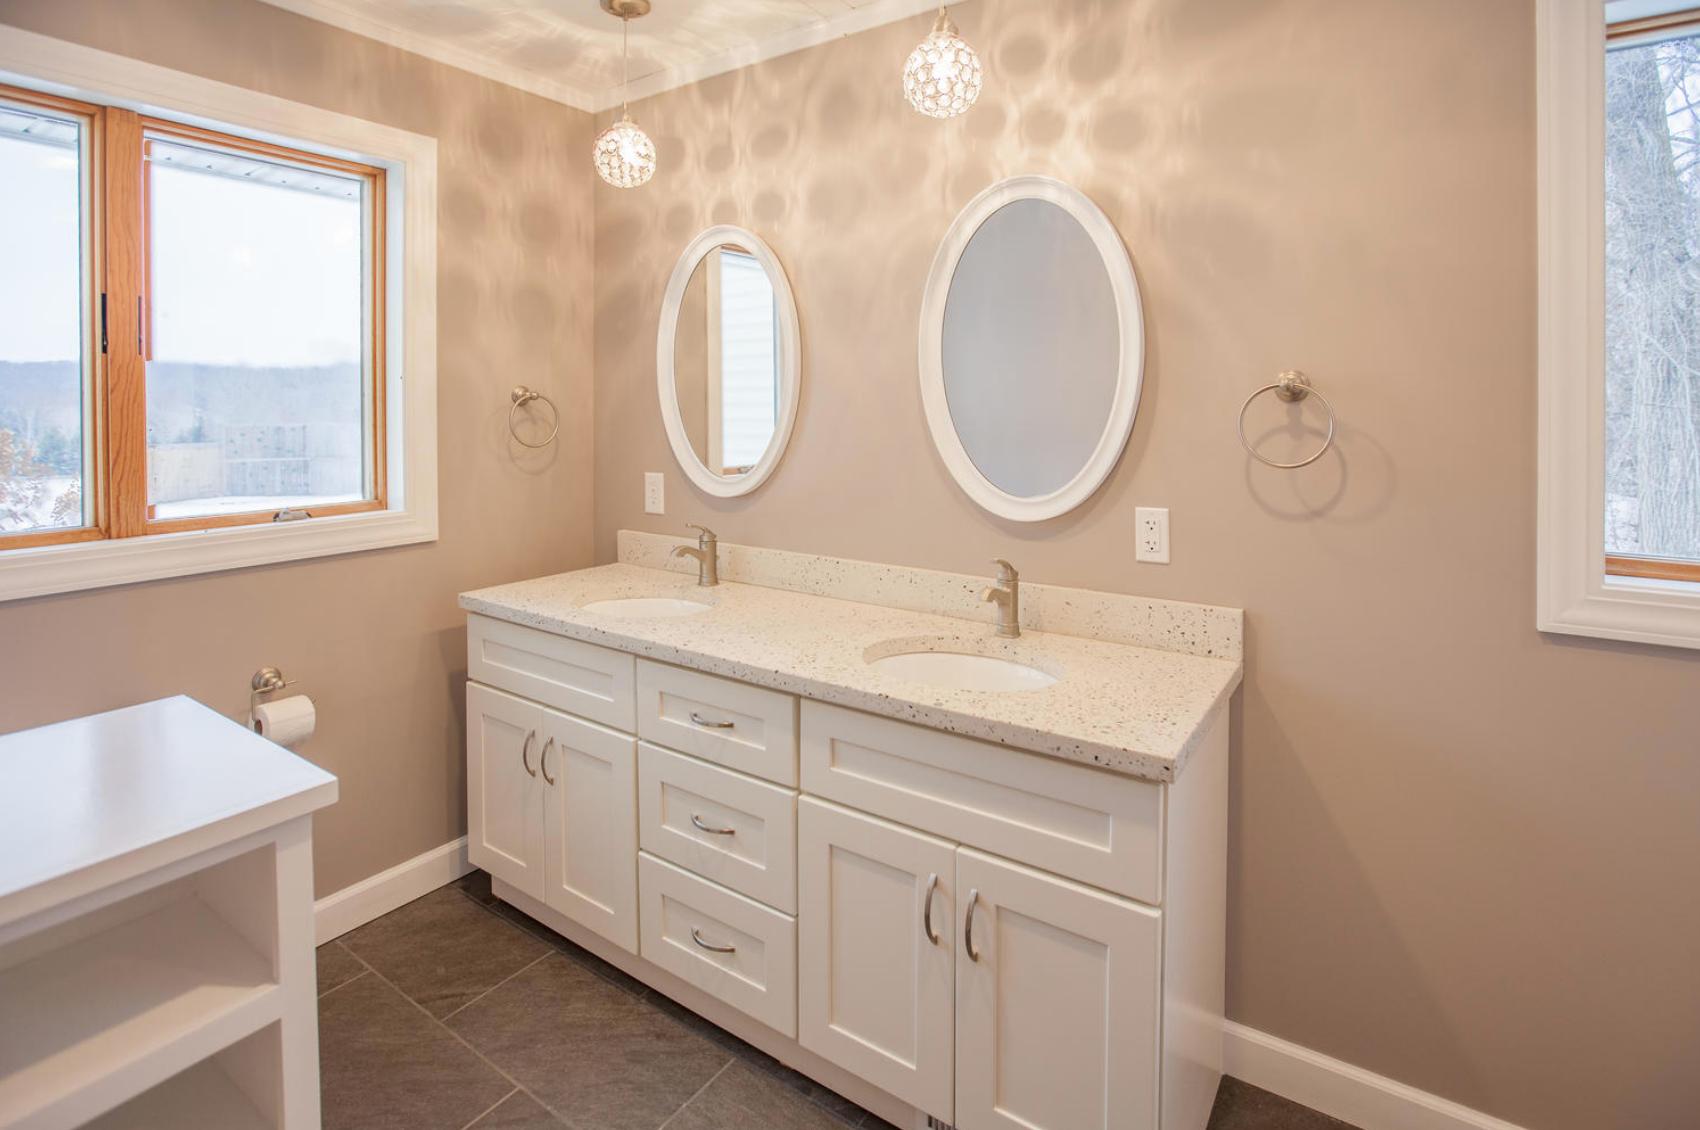 Concrete vanity with under mount sinks